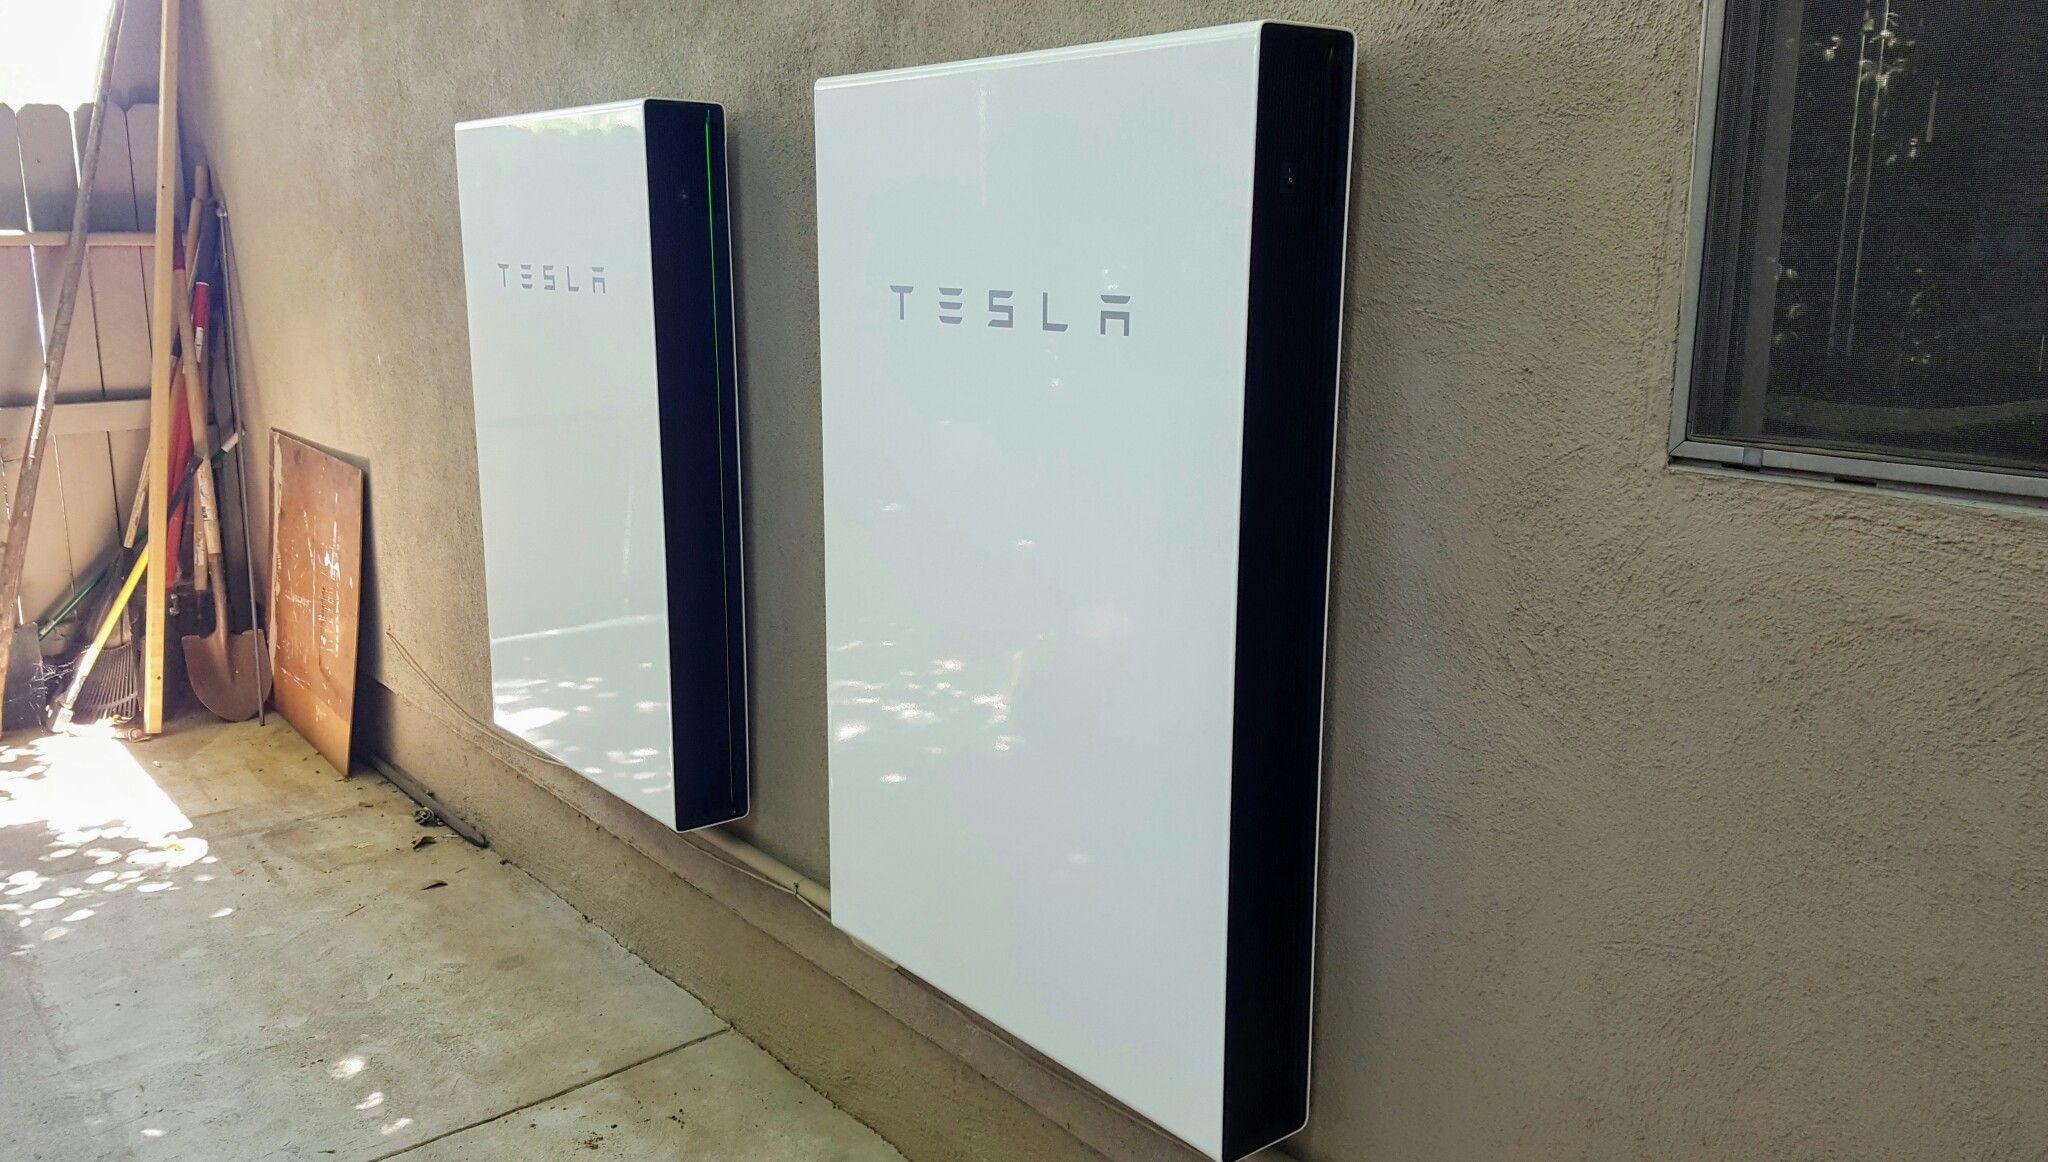 Tesla Powerwall 2 Battery Storage Solar Energy Diy Plants In Australia Power Plant